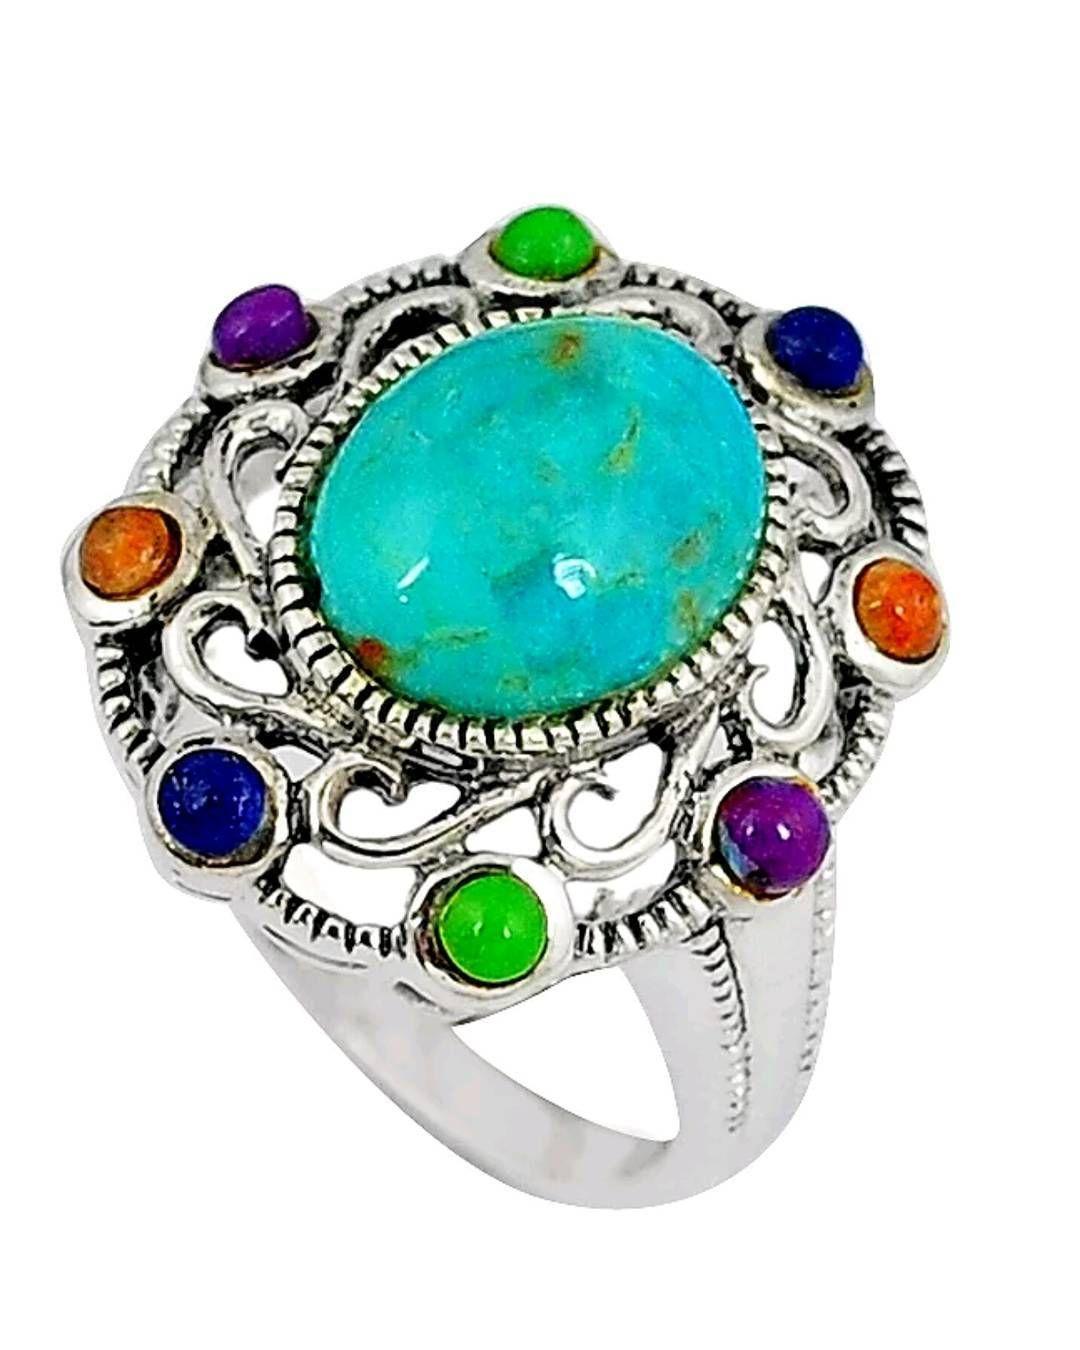 Com خاتم نسائي حجر فيروز طبيعي مصنوع من الفضه الاسترلينيه مقاس 6 Natural Terquase Ladies Ring Made Of Sterling Silver S Turquoise Bracelet Jewelry Turquoise